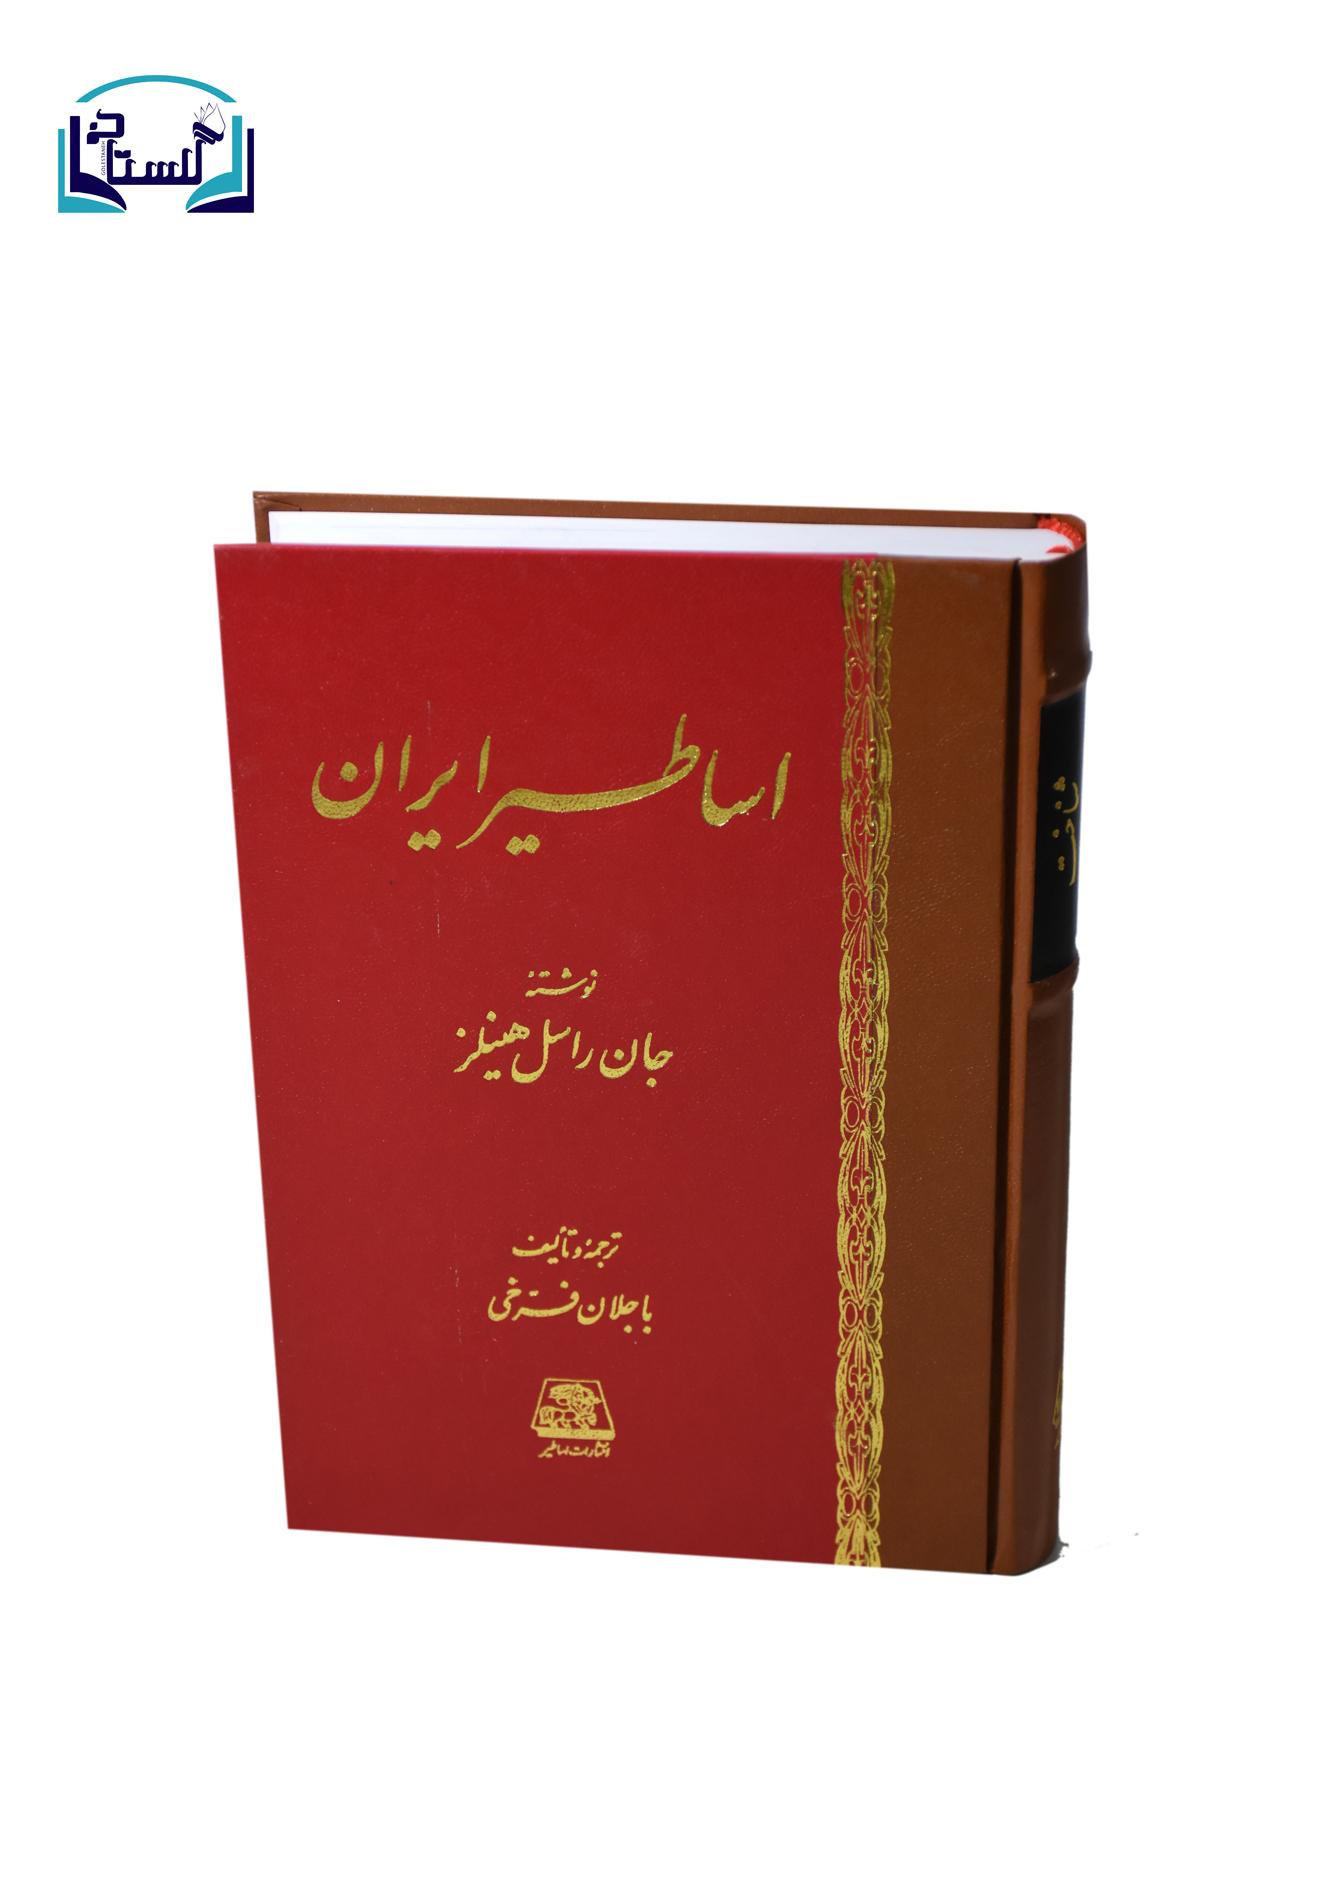 اساطير-ايران-(اساطير)-وزيري-زركوب